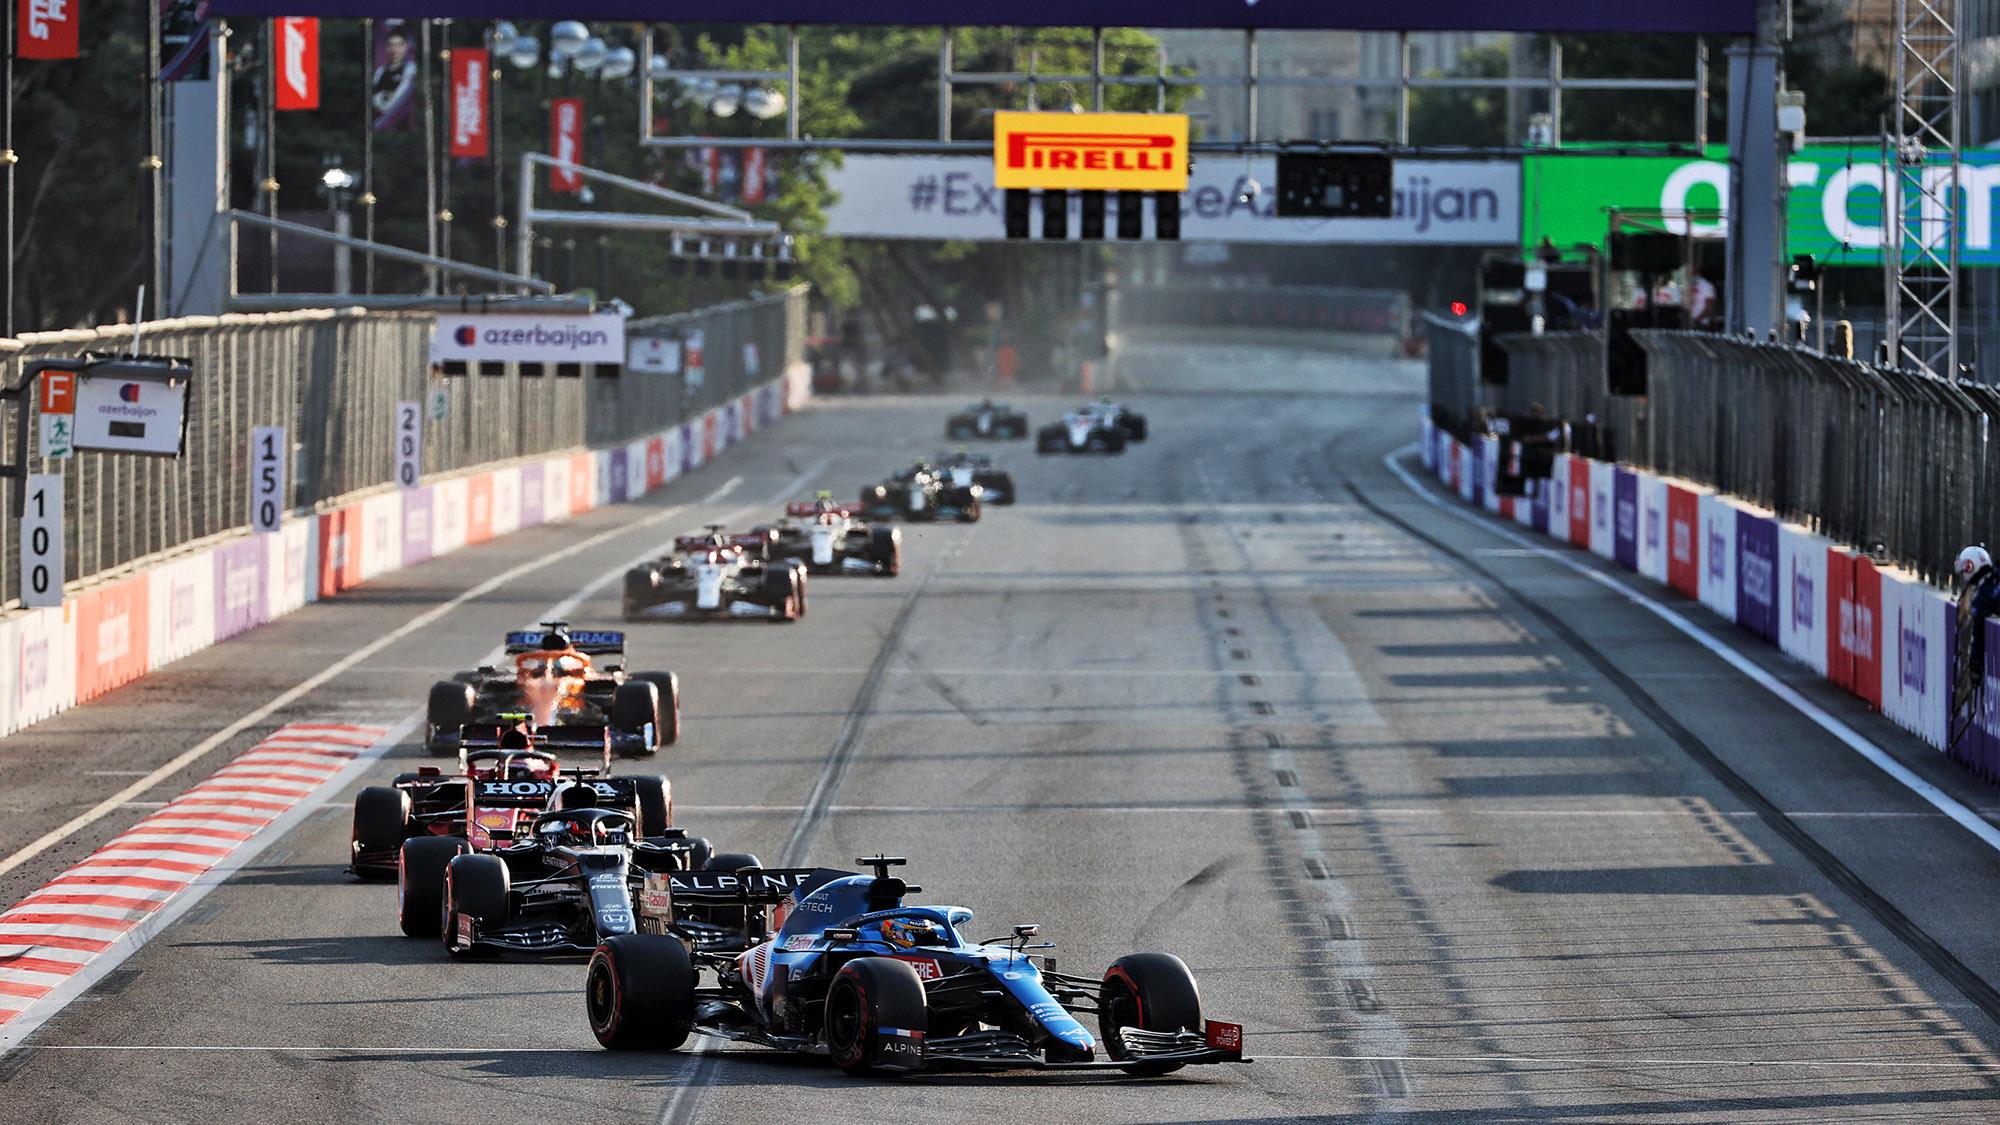 Fernando Alonso leads a line of cars at the 2021 Azerbaijan Grand Prix